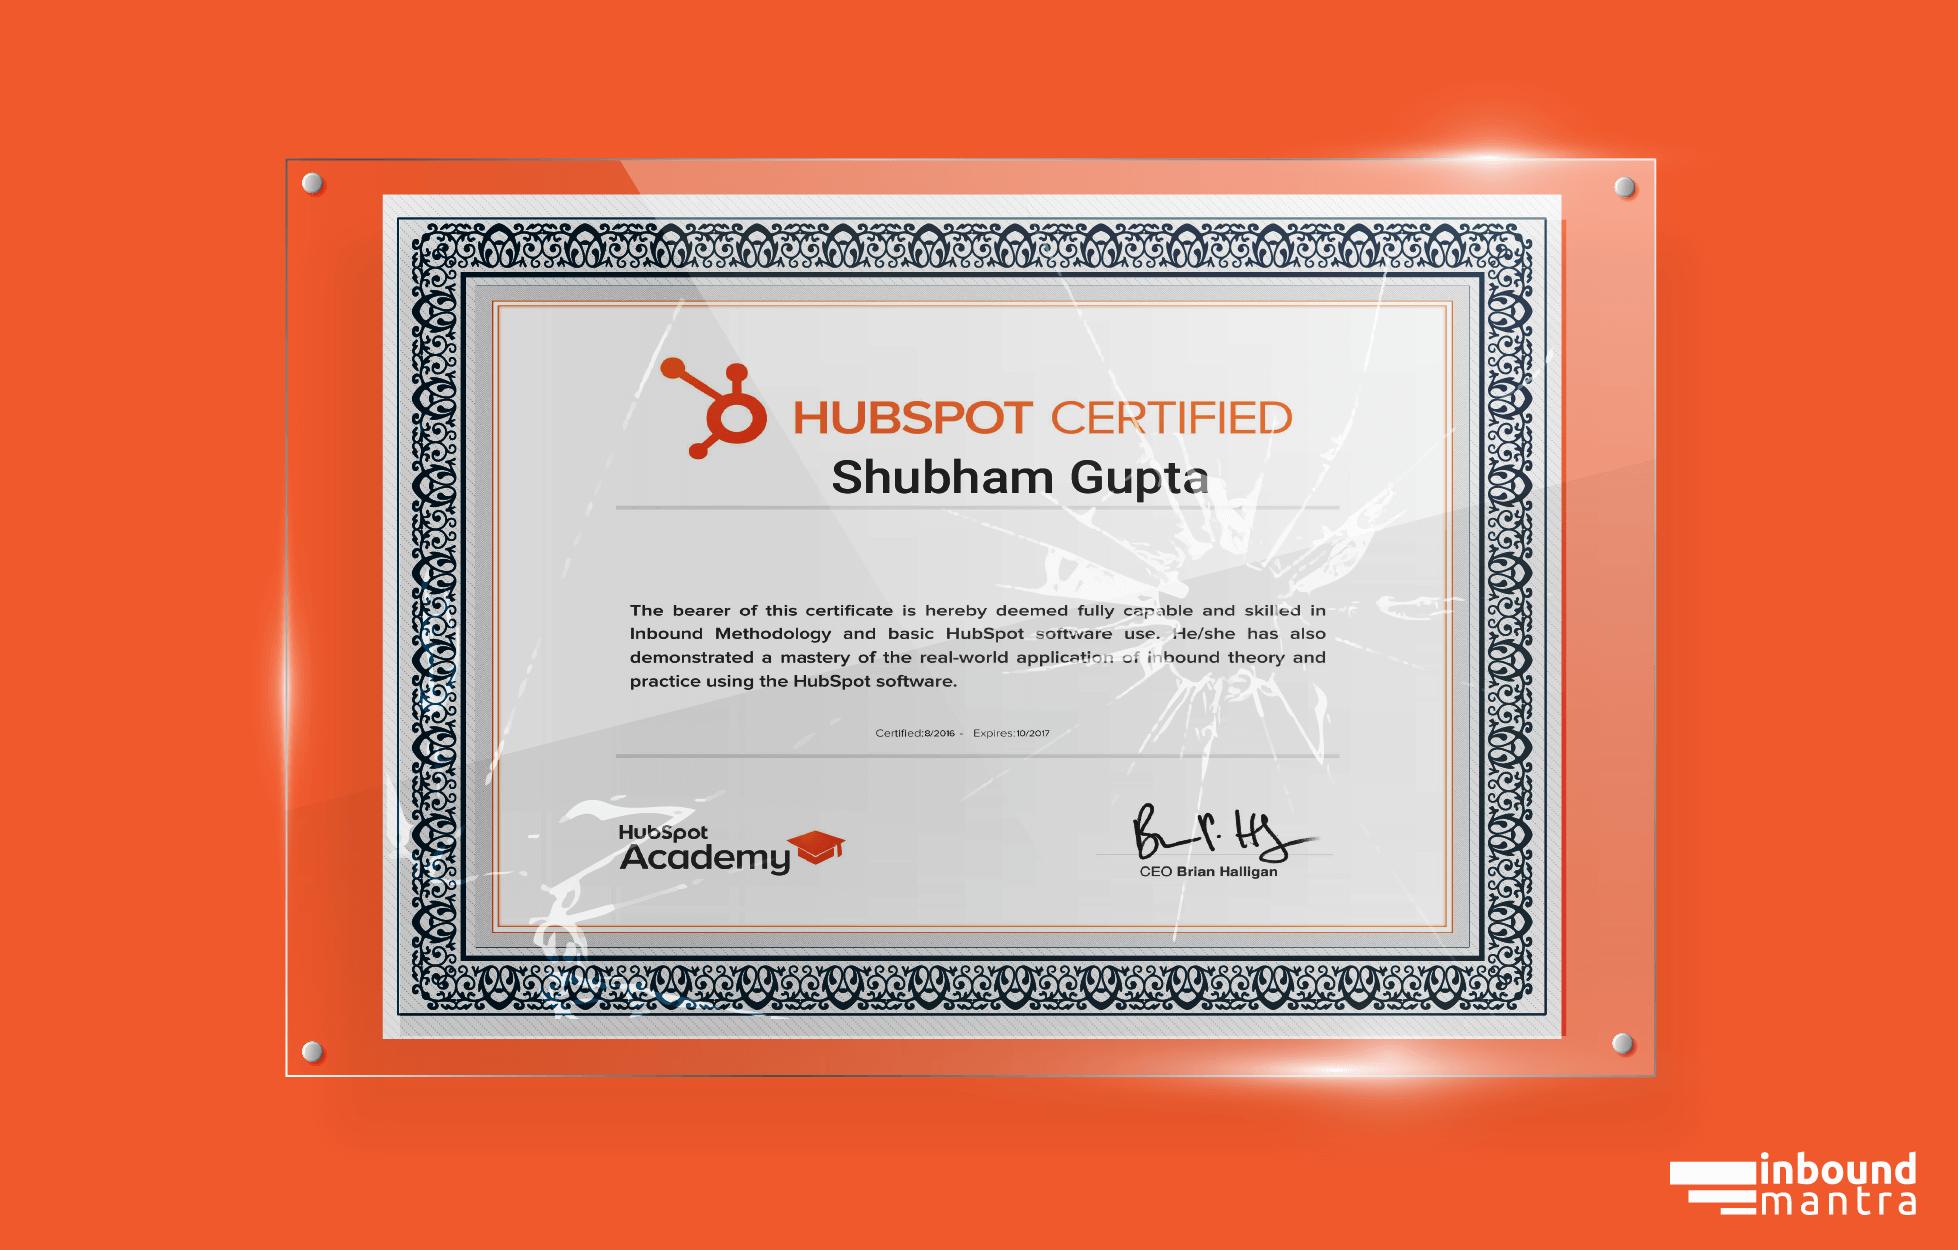 Is HubSpot Certification ideal?